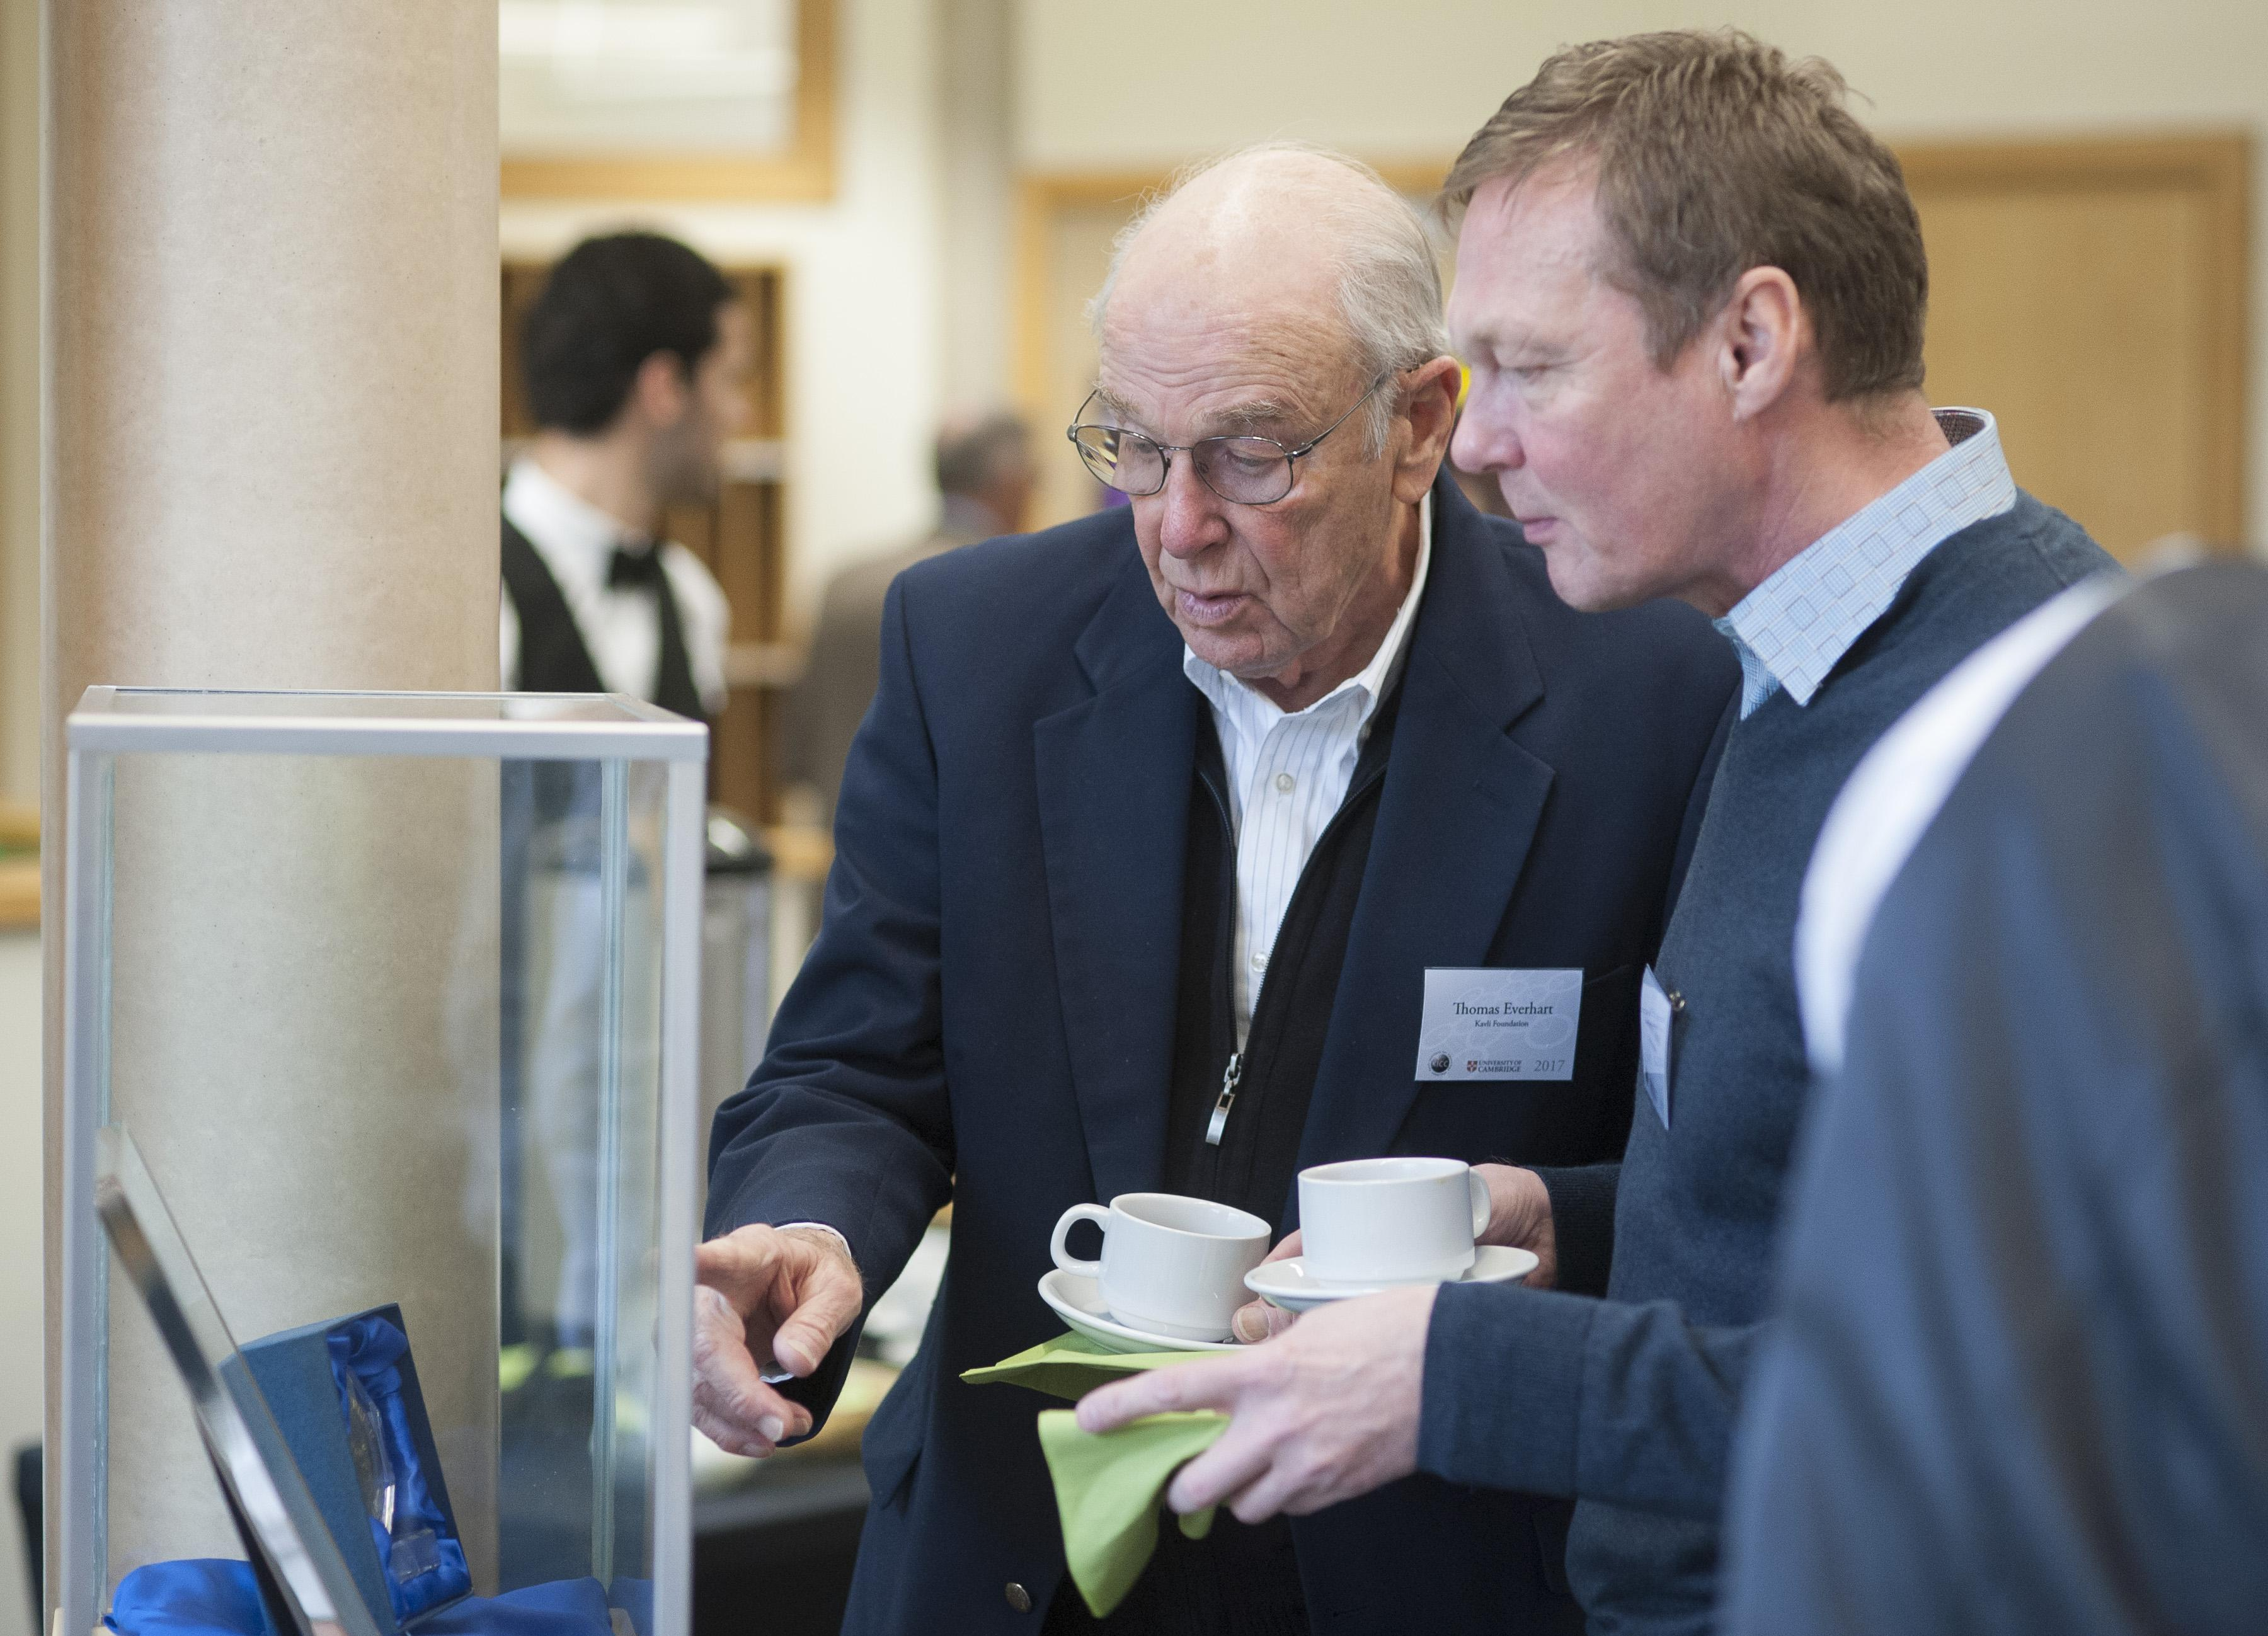 Thomas Everhart and Gunnar Nilsen (Kavli Foundation Directors), looking at Donald Lynden-Bell's Kavli Prize Medal